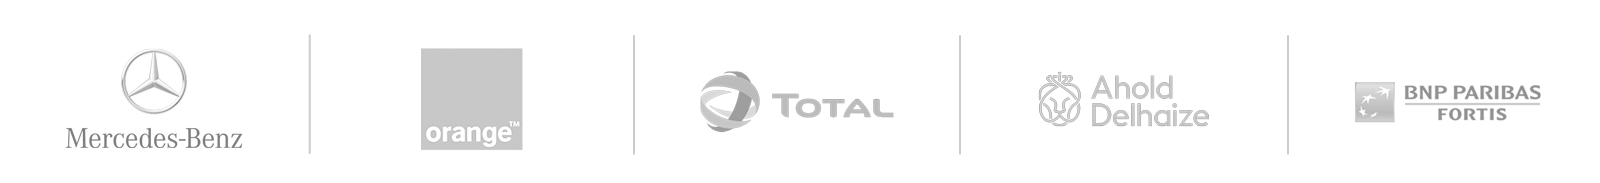 banner-logo-marketers